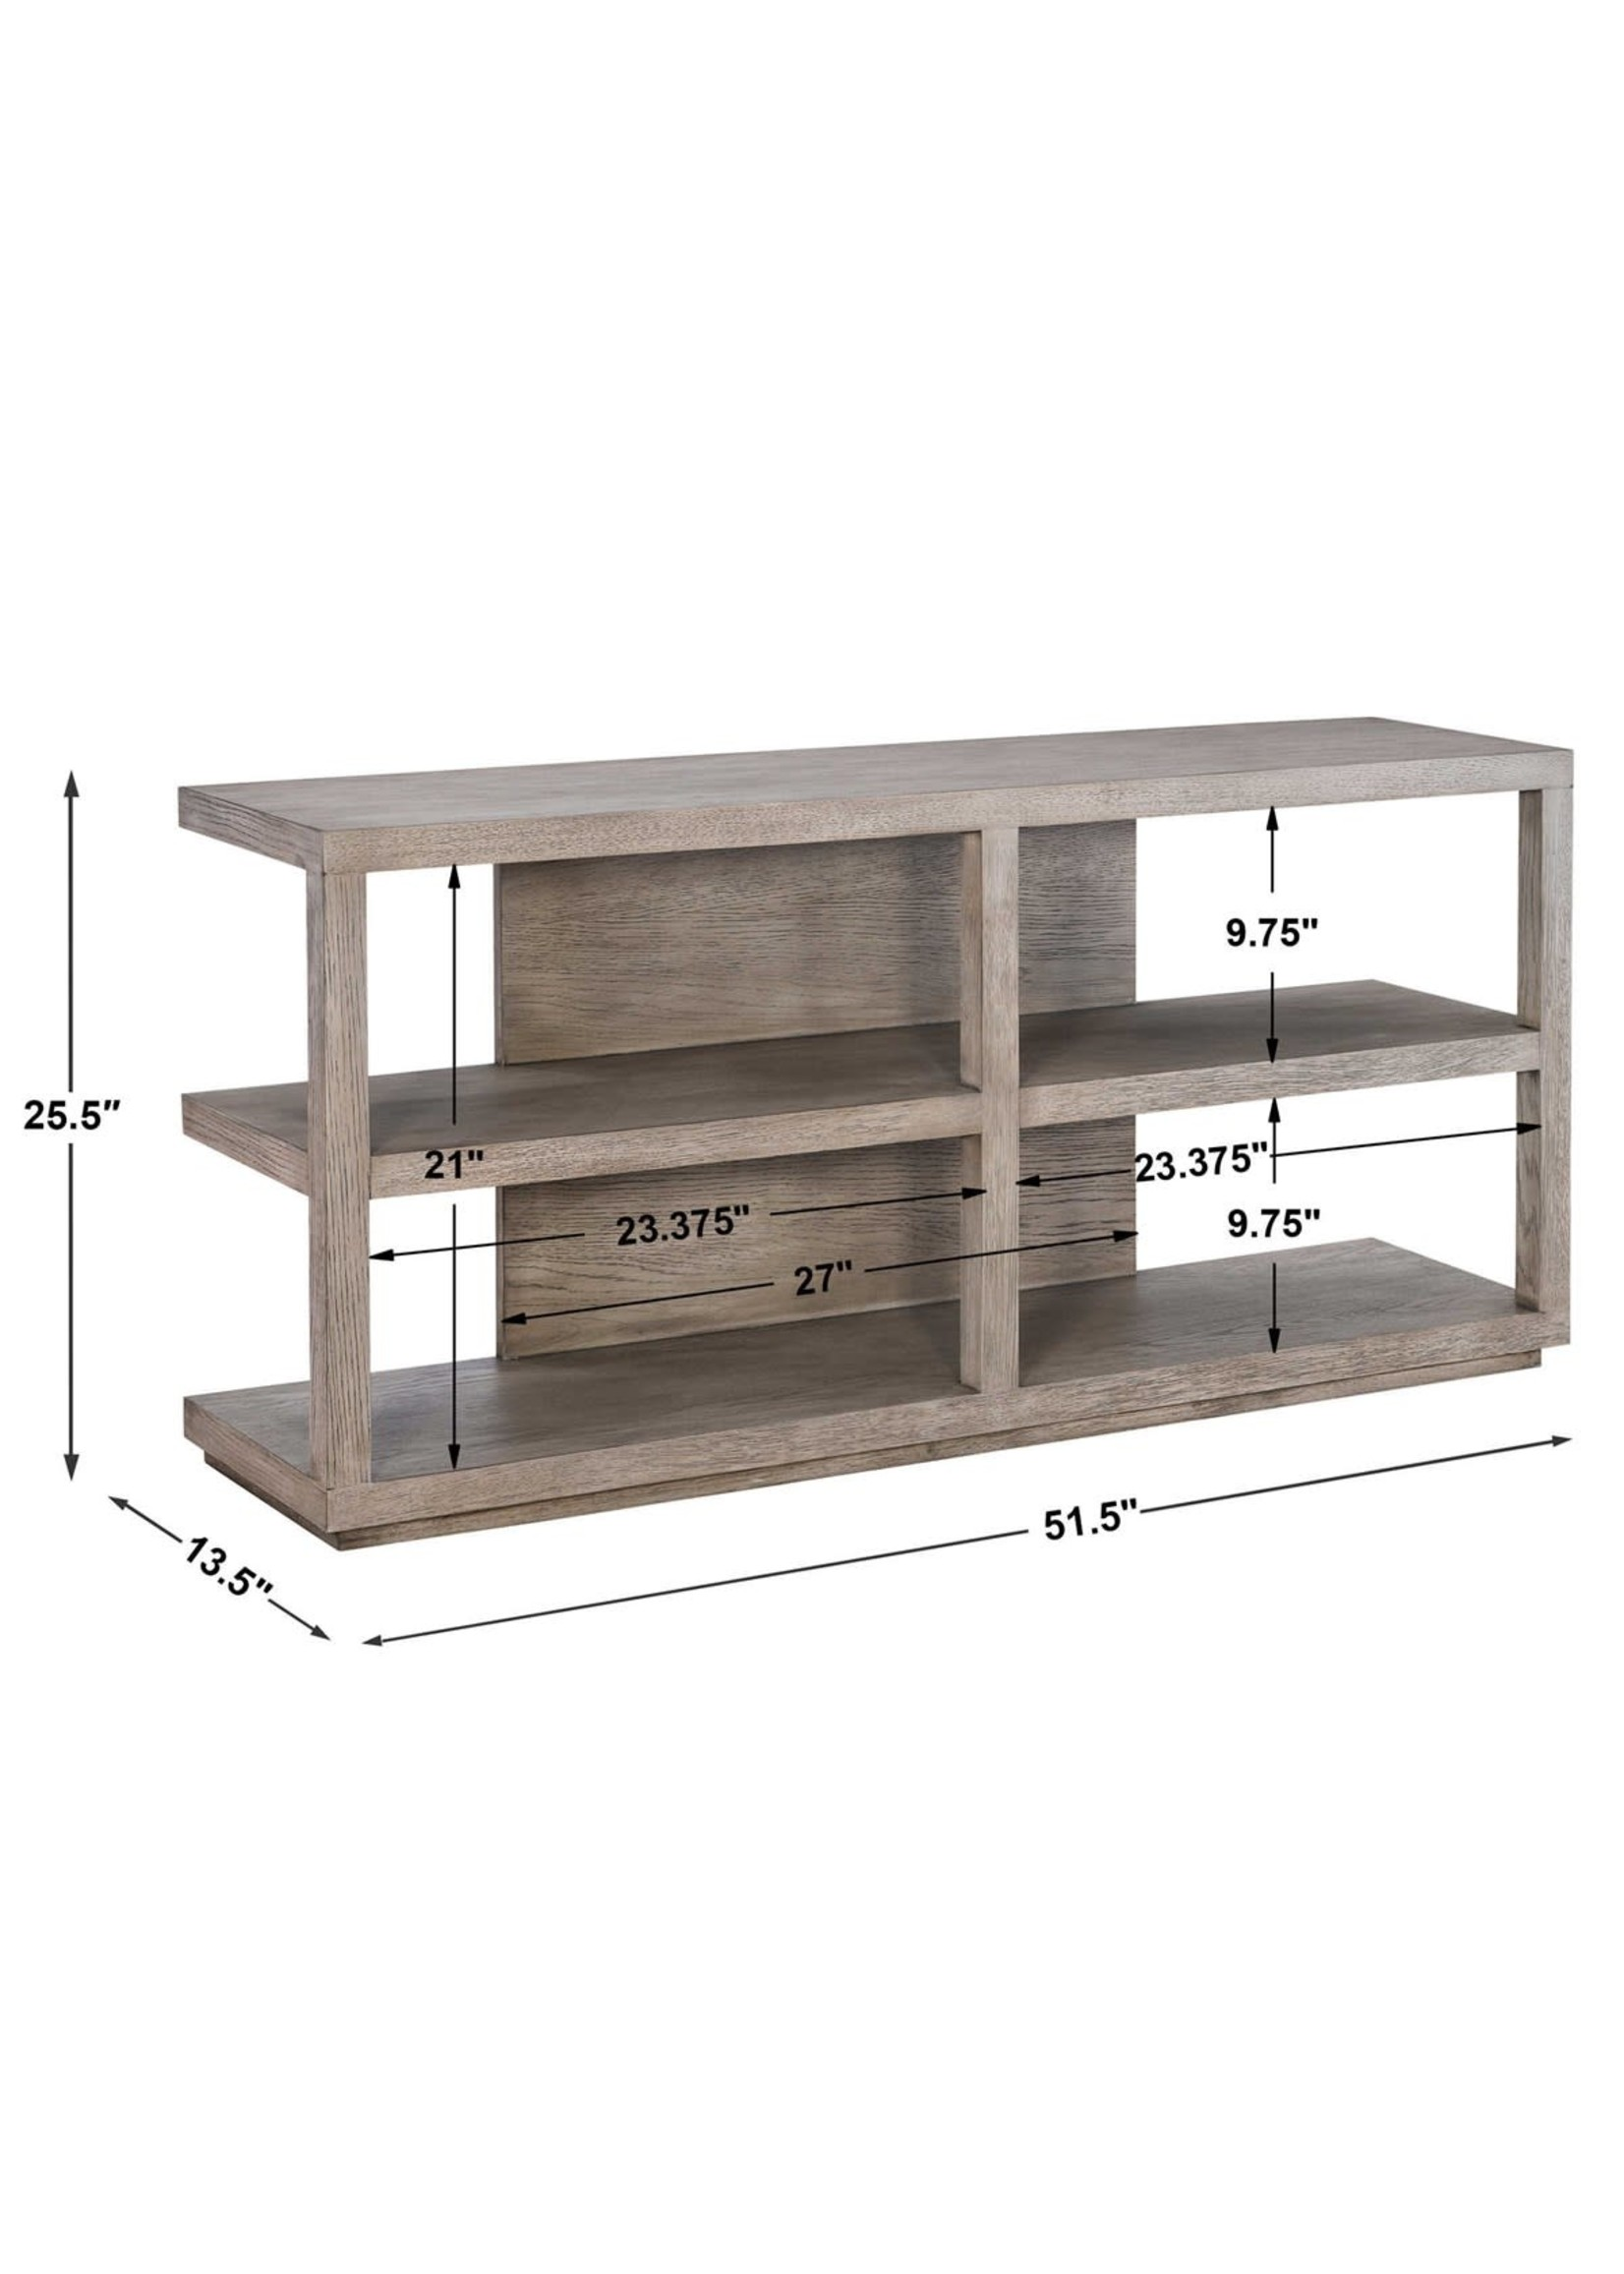 HAVEN LONG SOFA TABLE